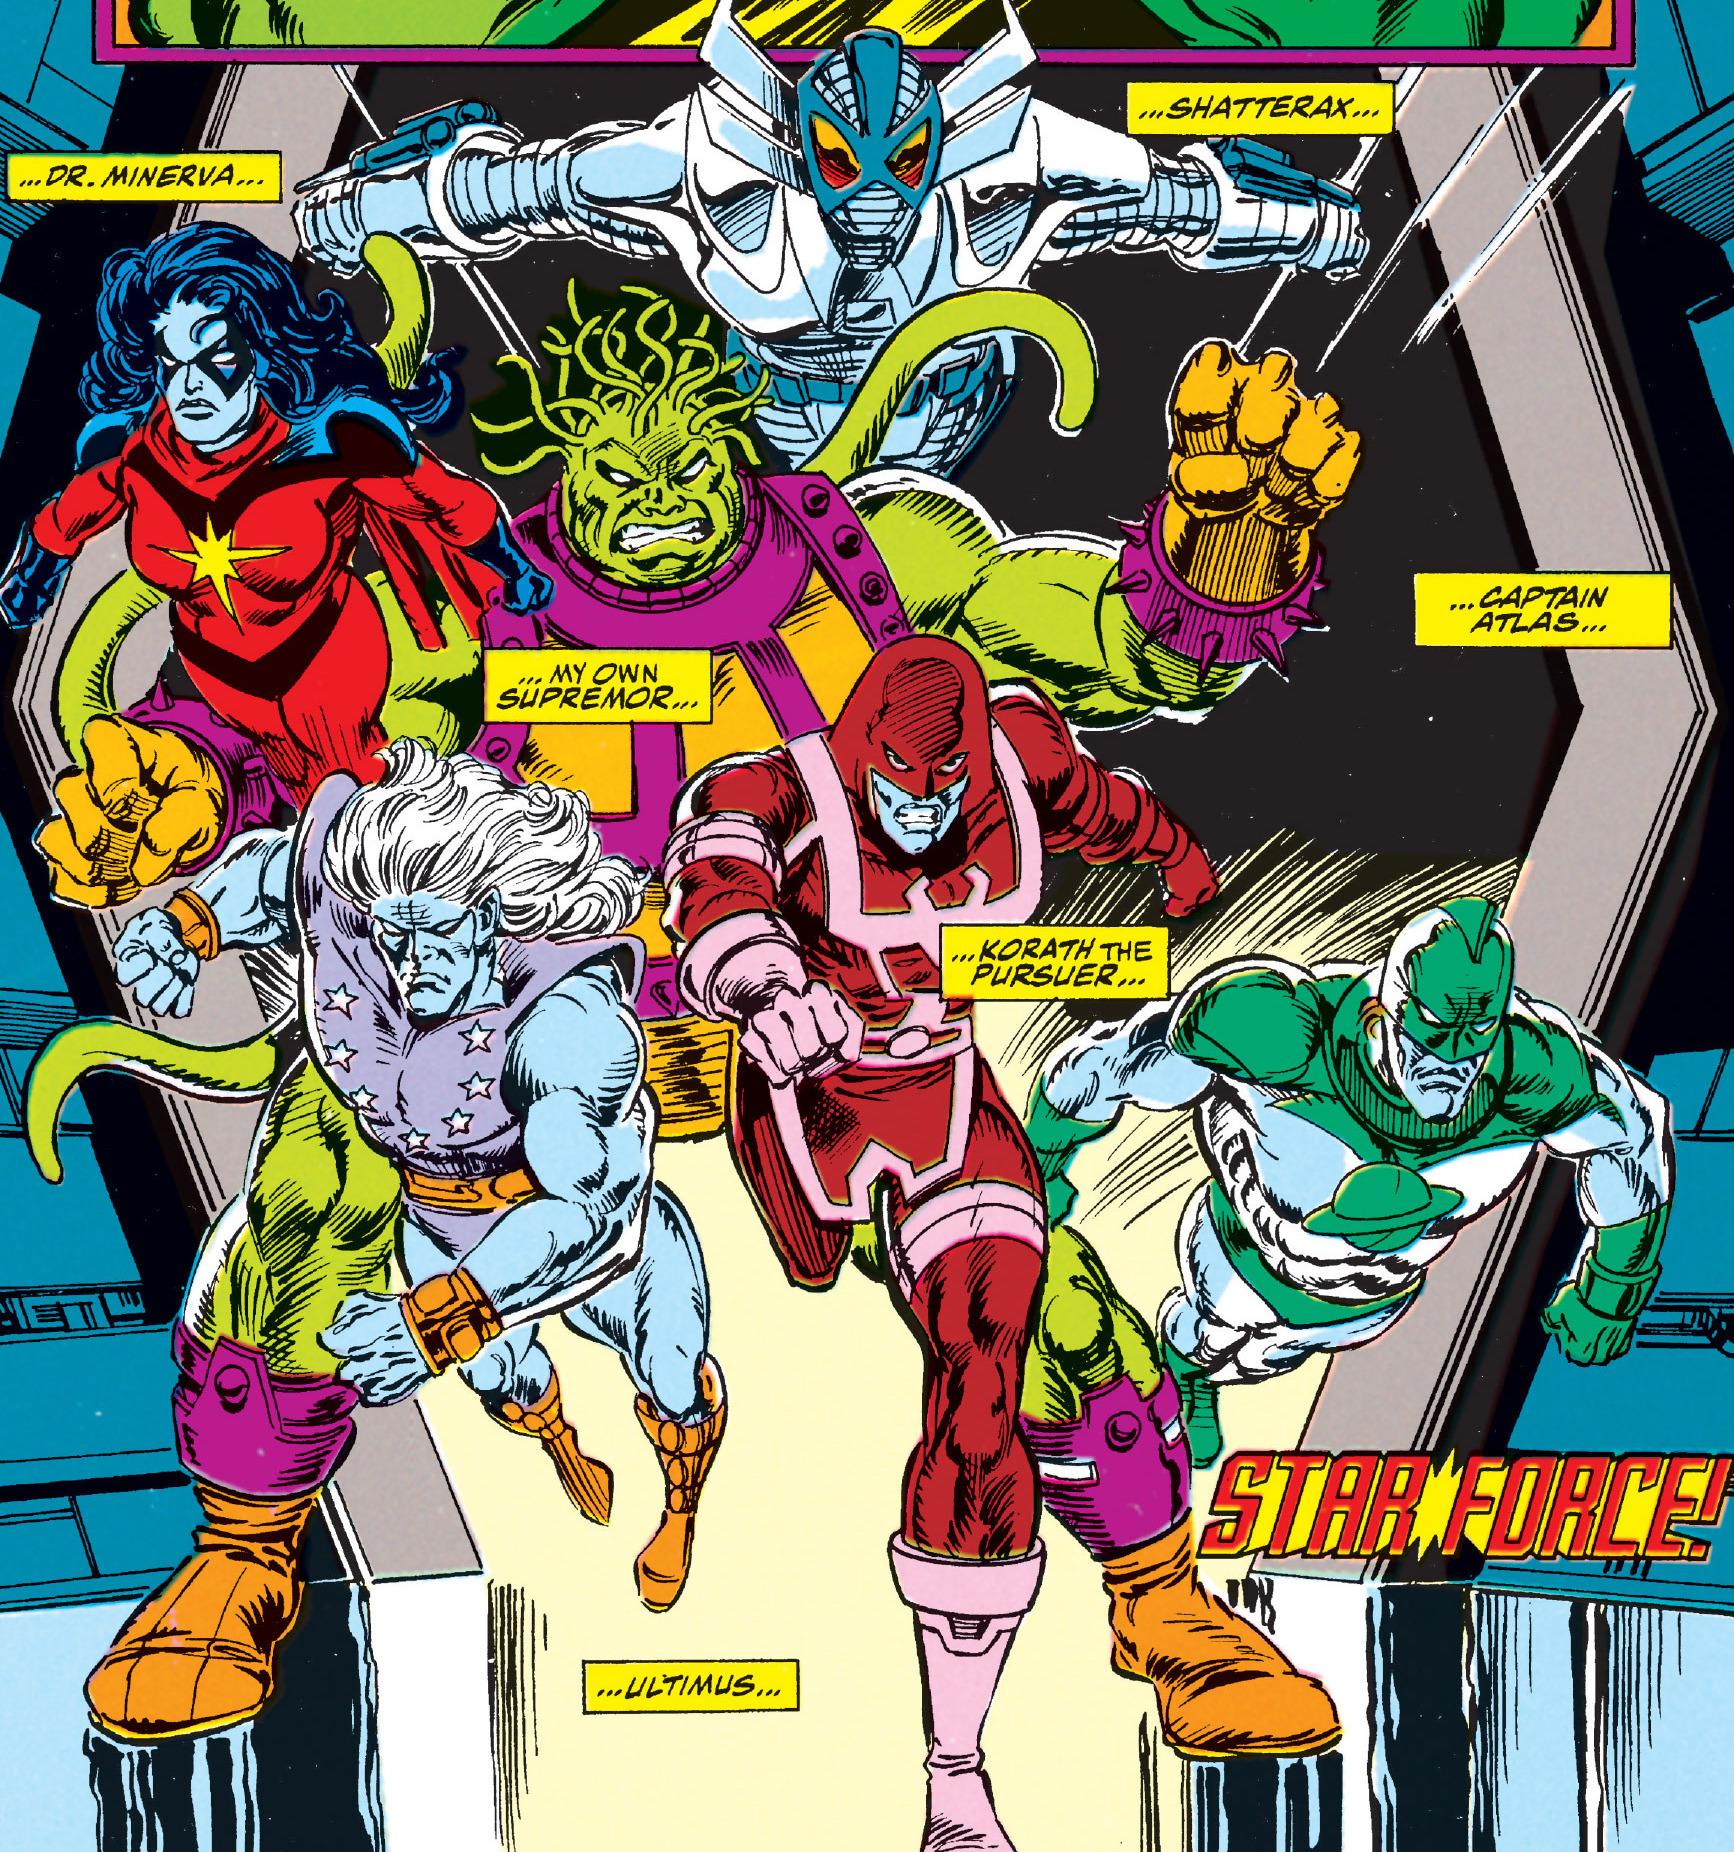 Avengers vol. 1 #346